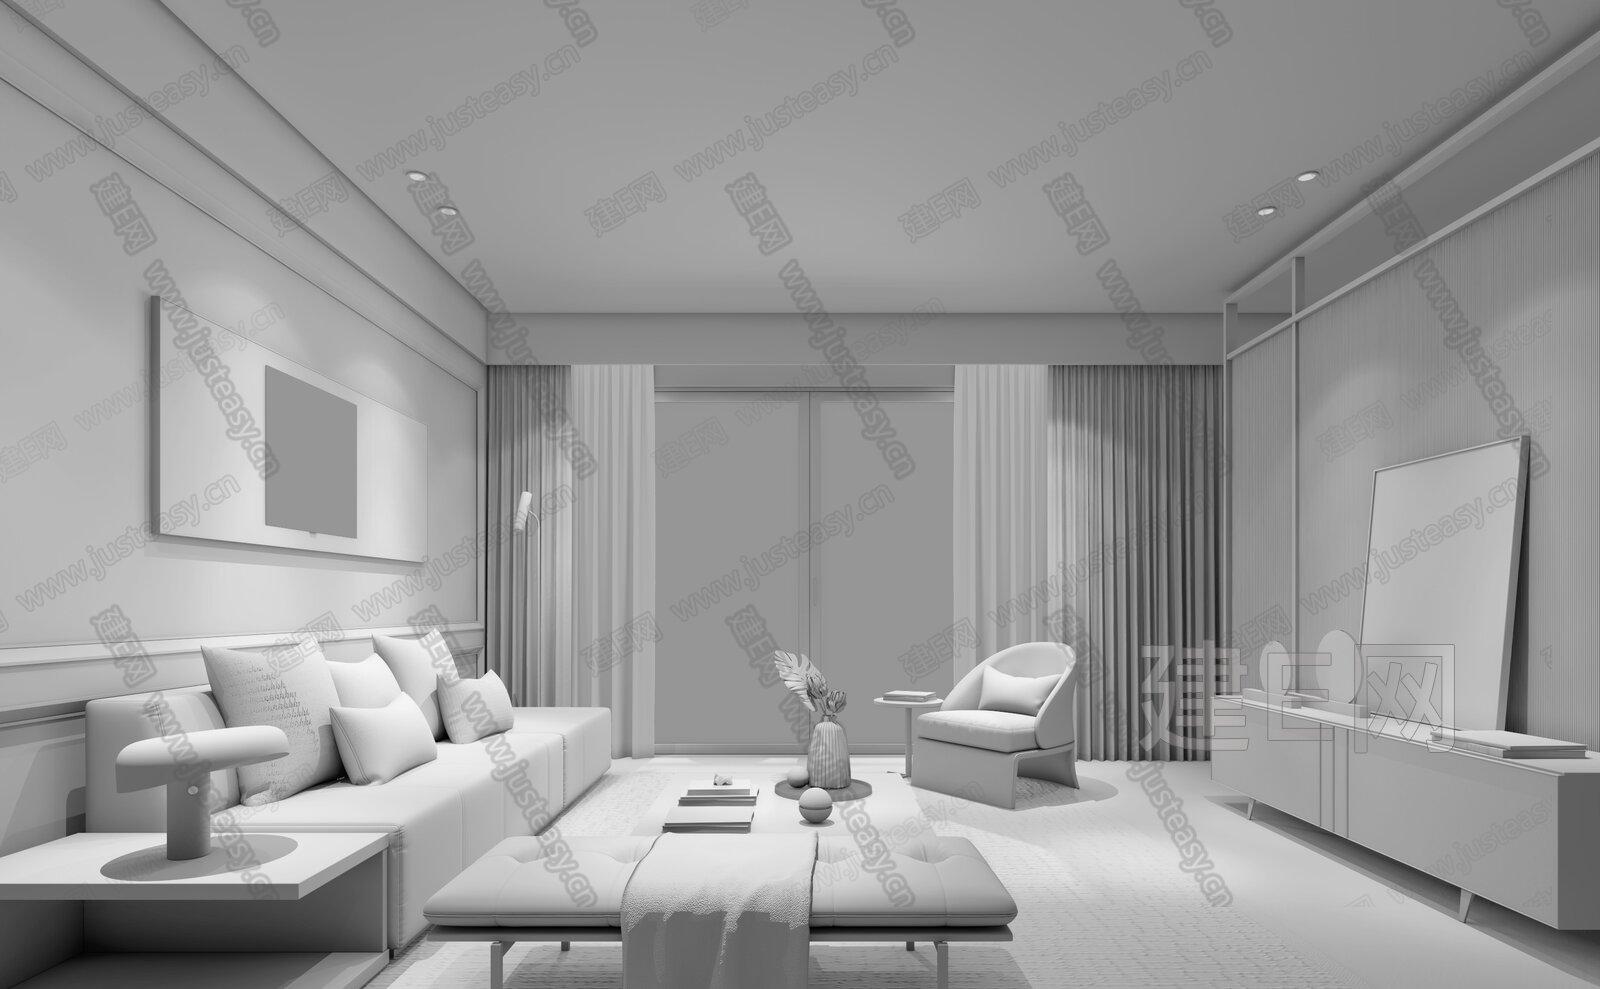 HCD IMPRESS柏年印象 福州长乐阳光城蓝光·璟月 现代客厅3d模型